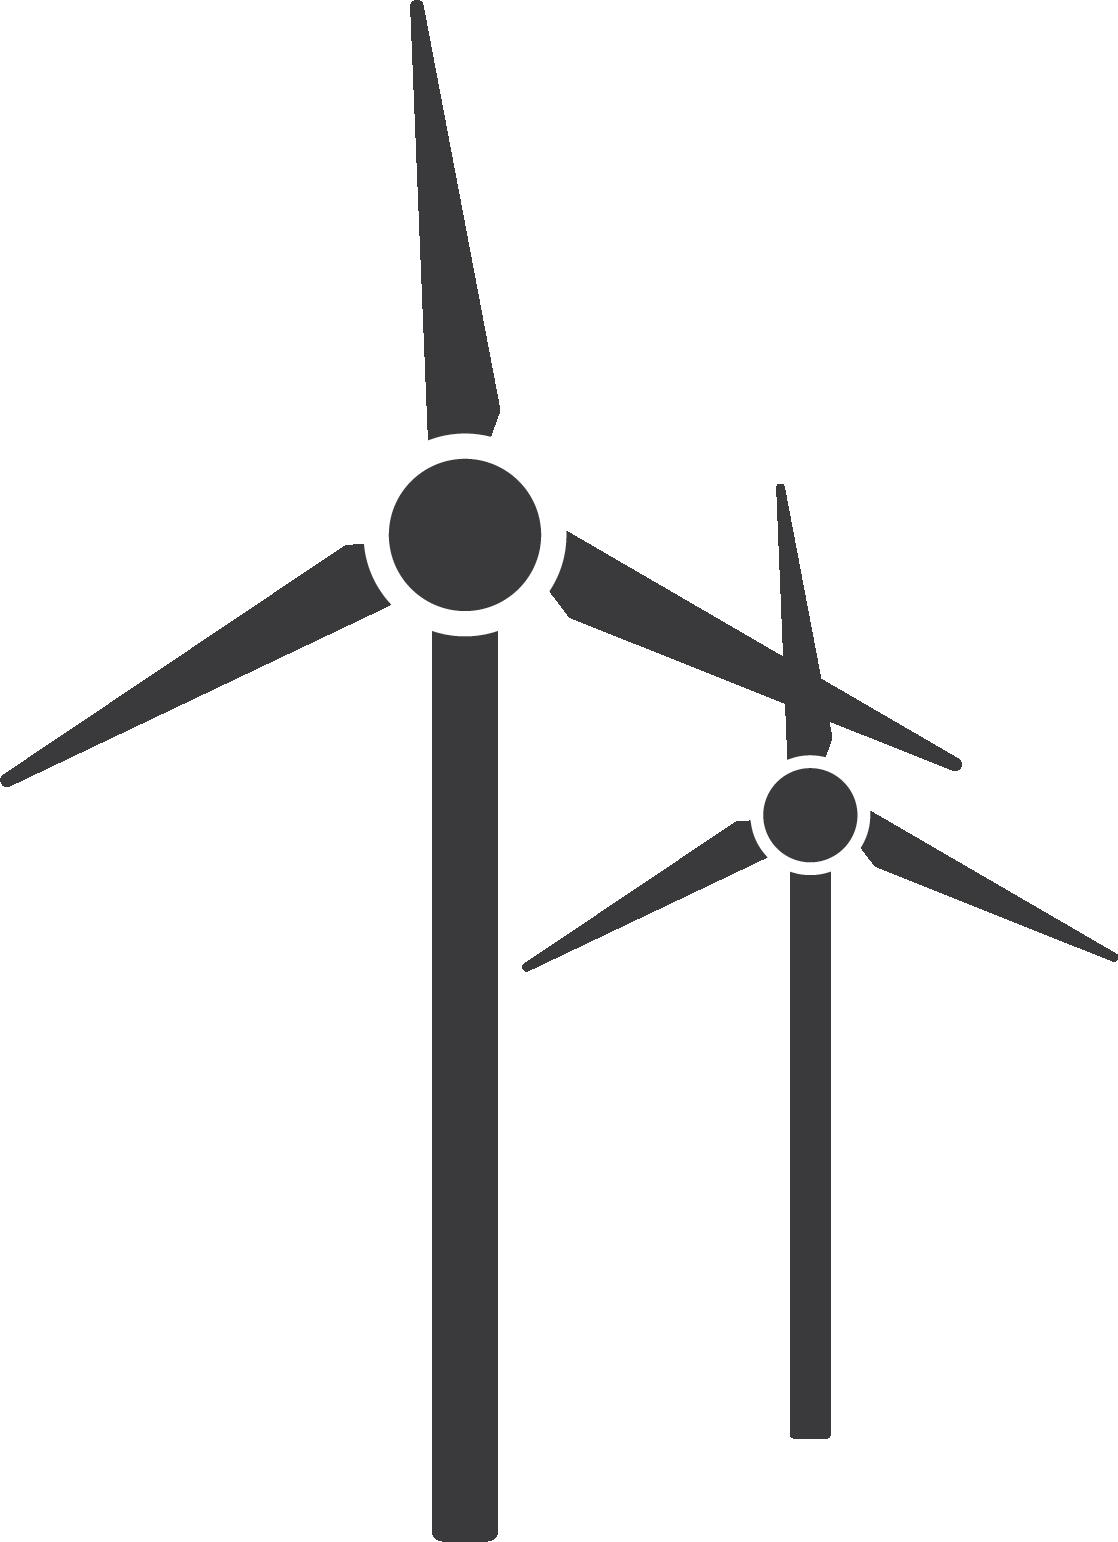 wind turbines.png